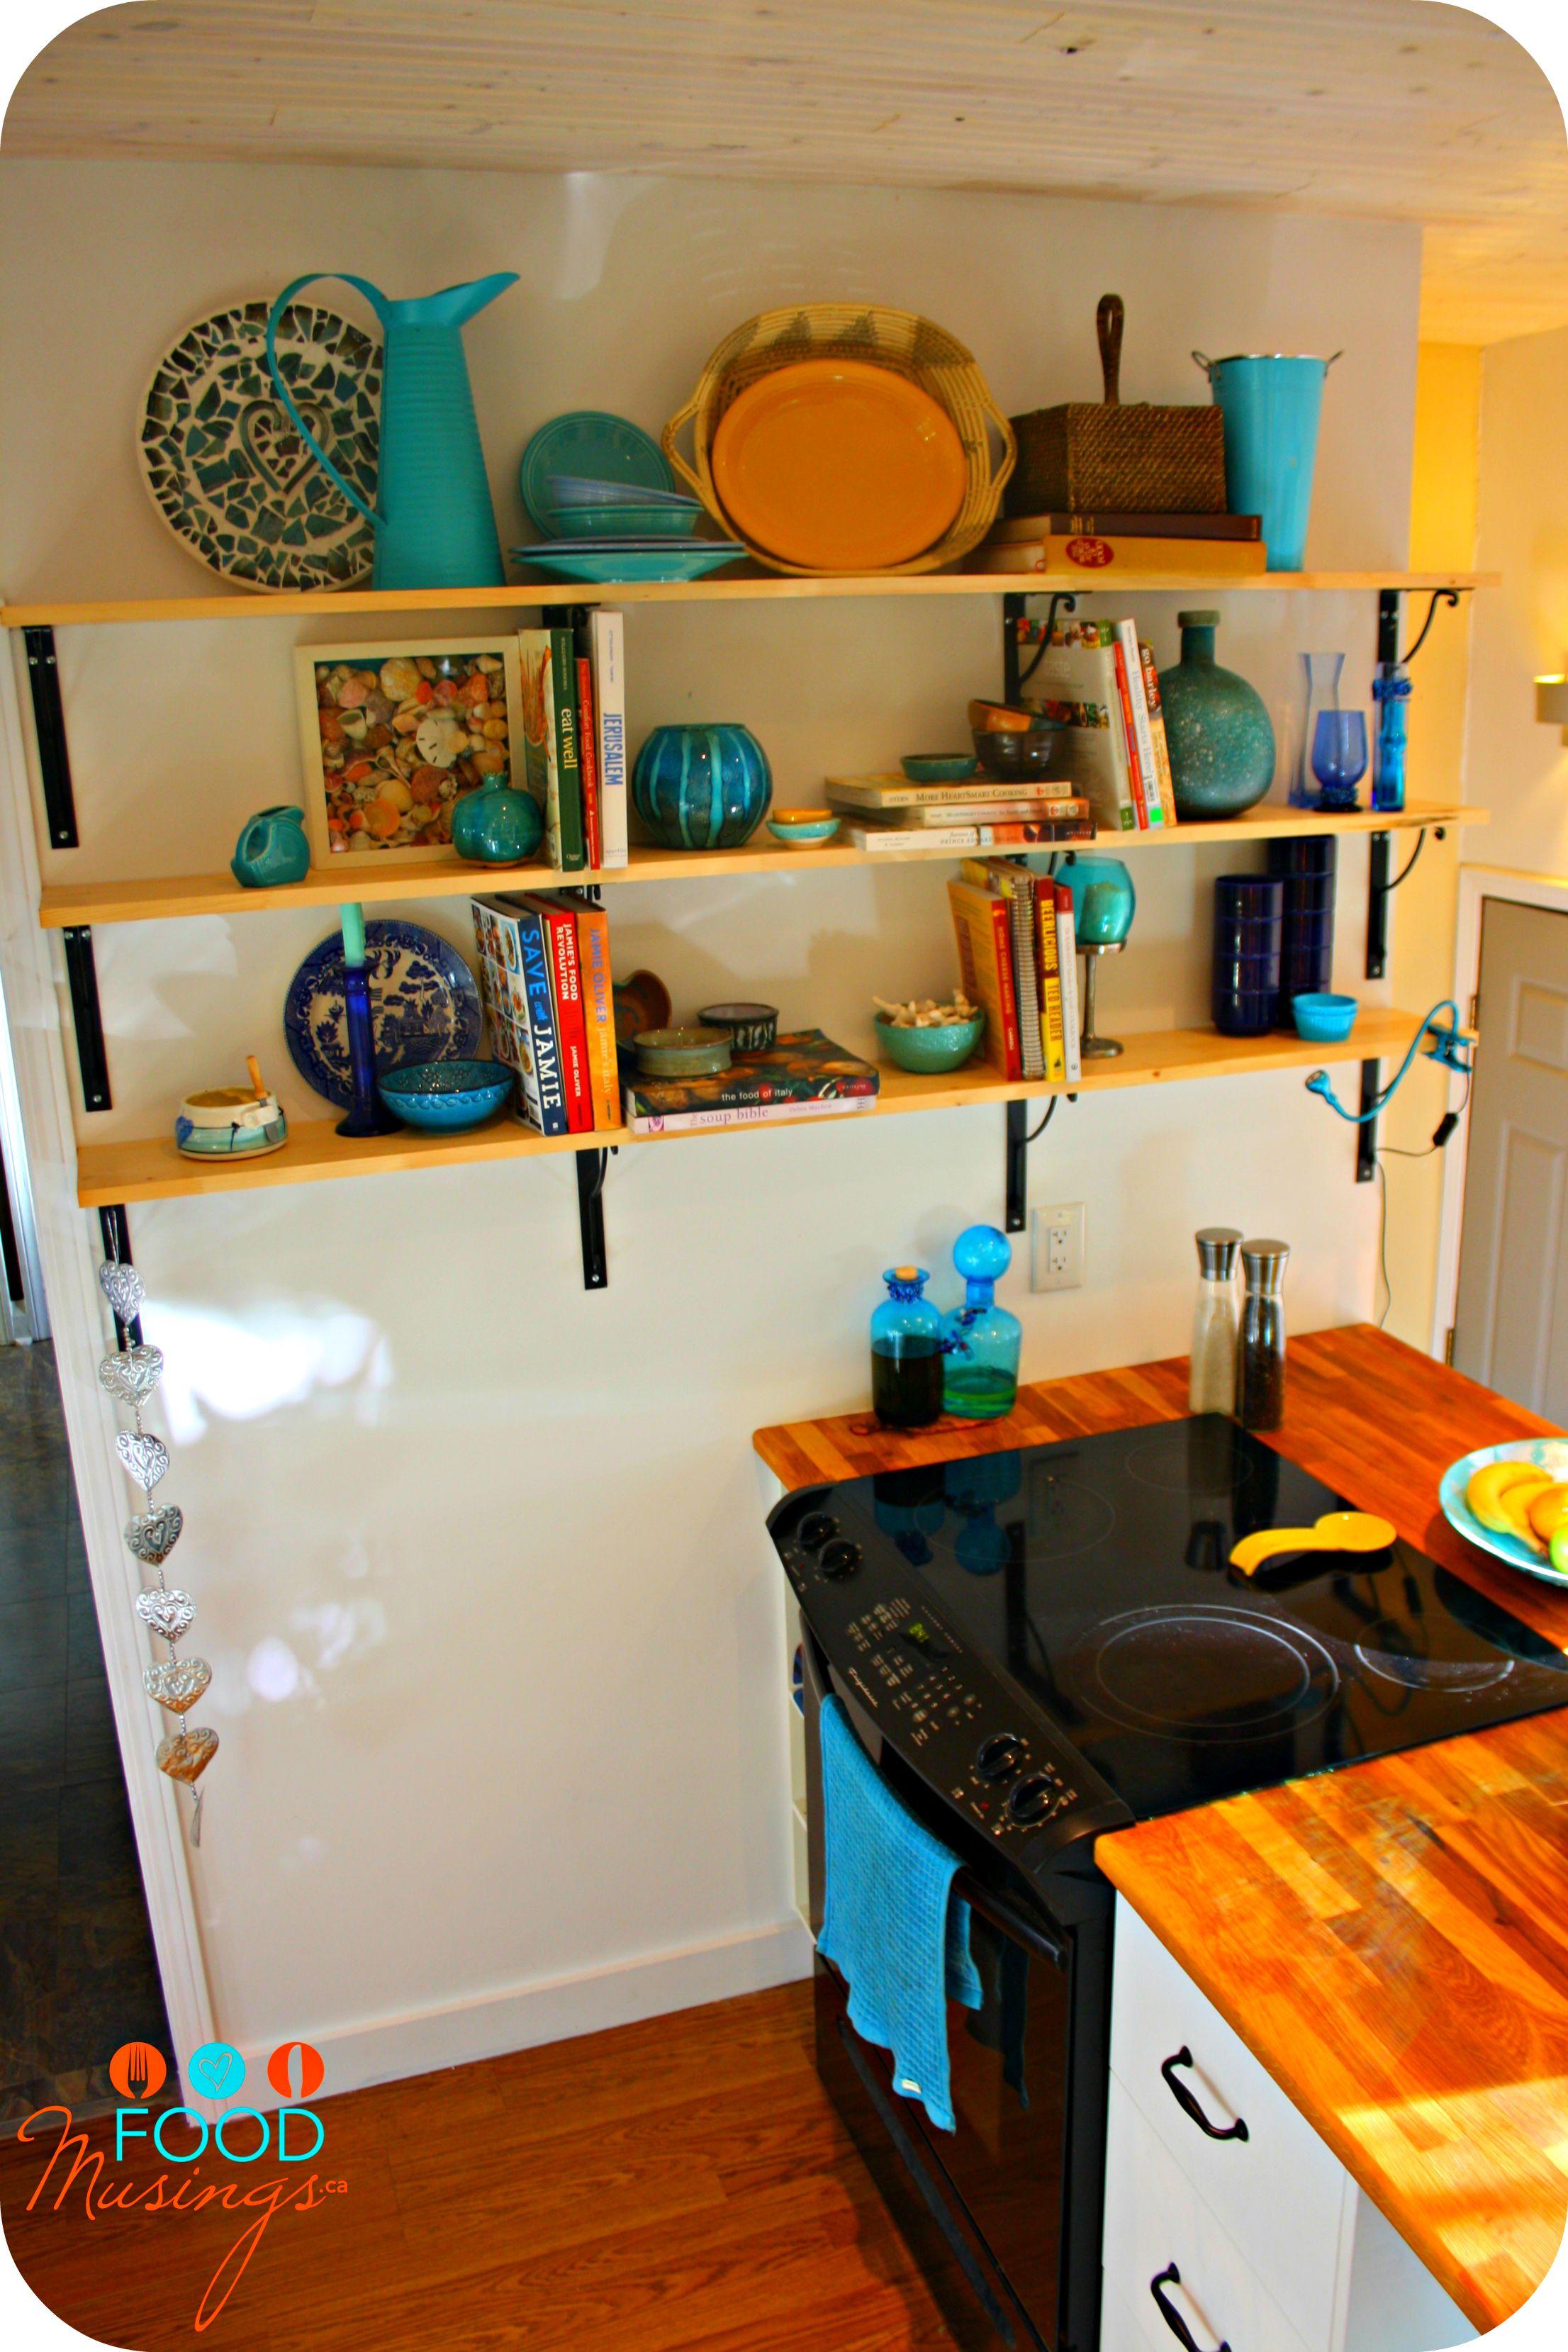 Decorative Kitchen Shelf Decorative Set For The Kitchen Vintage Kitchen Accessories 3d